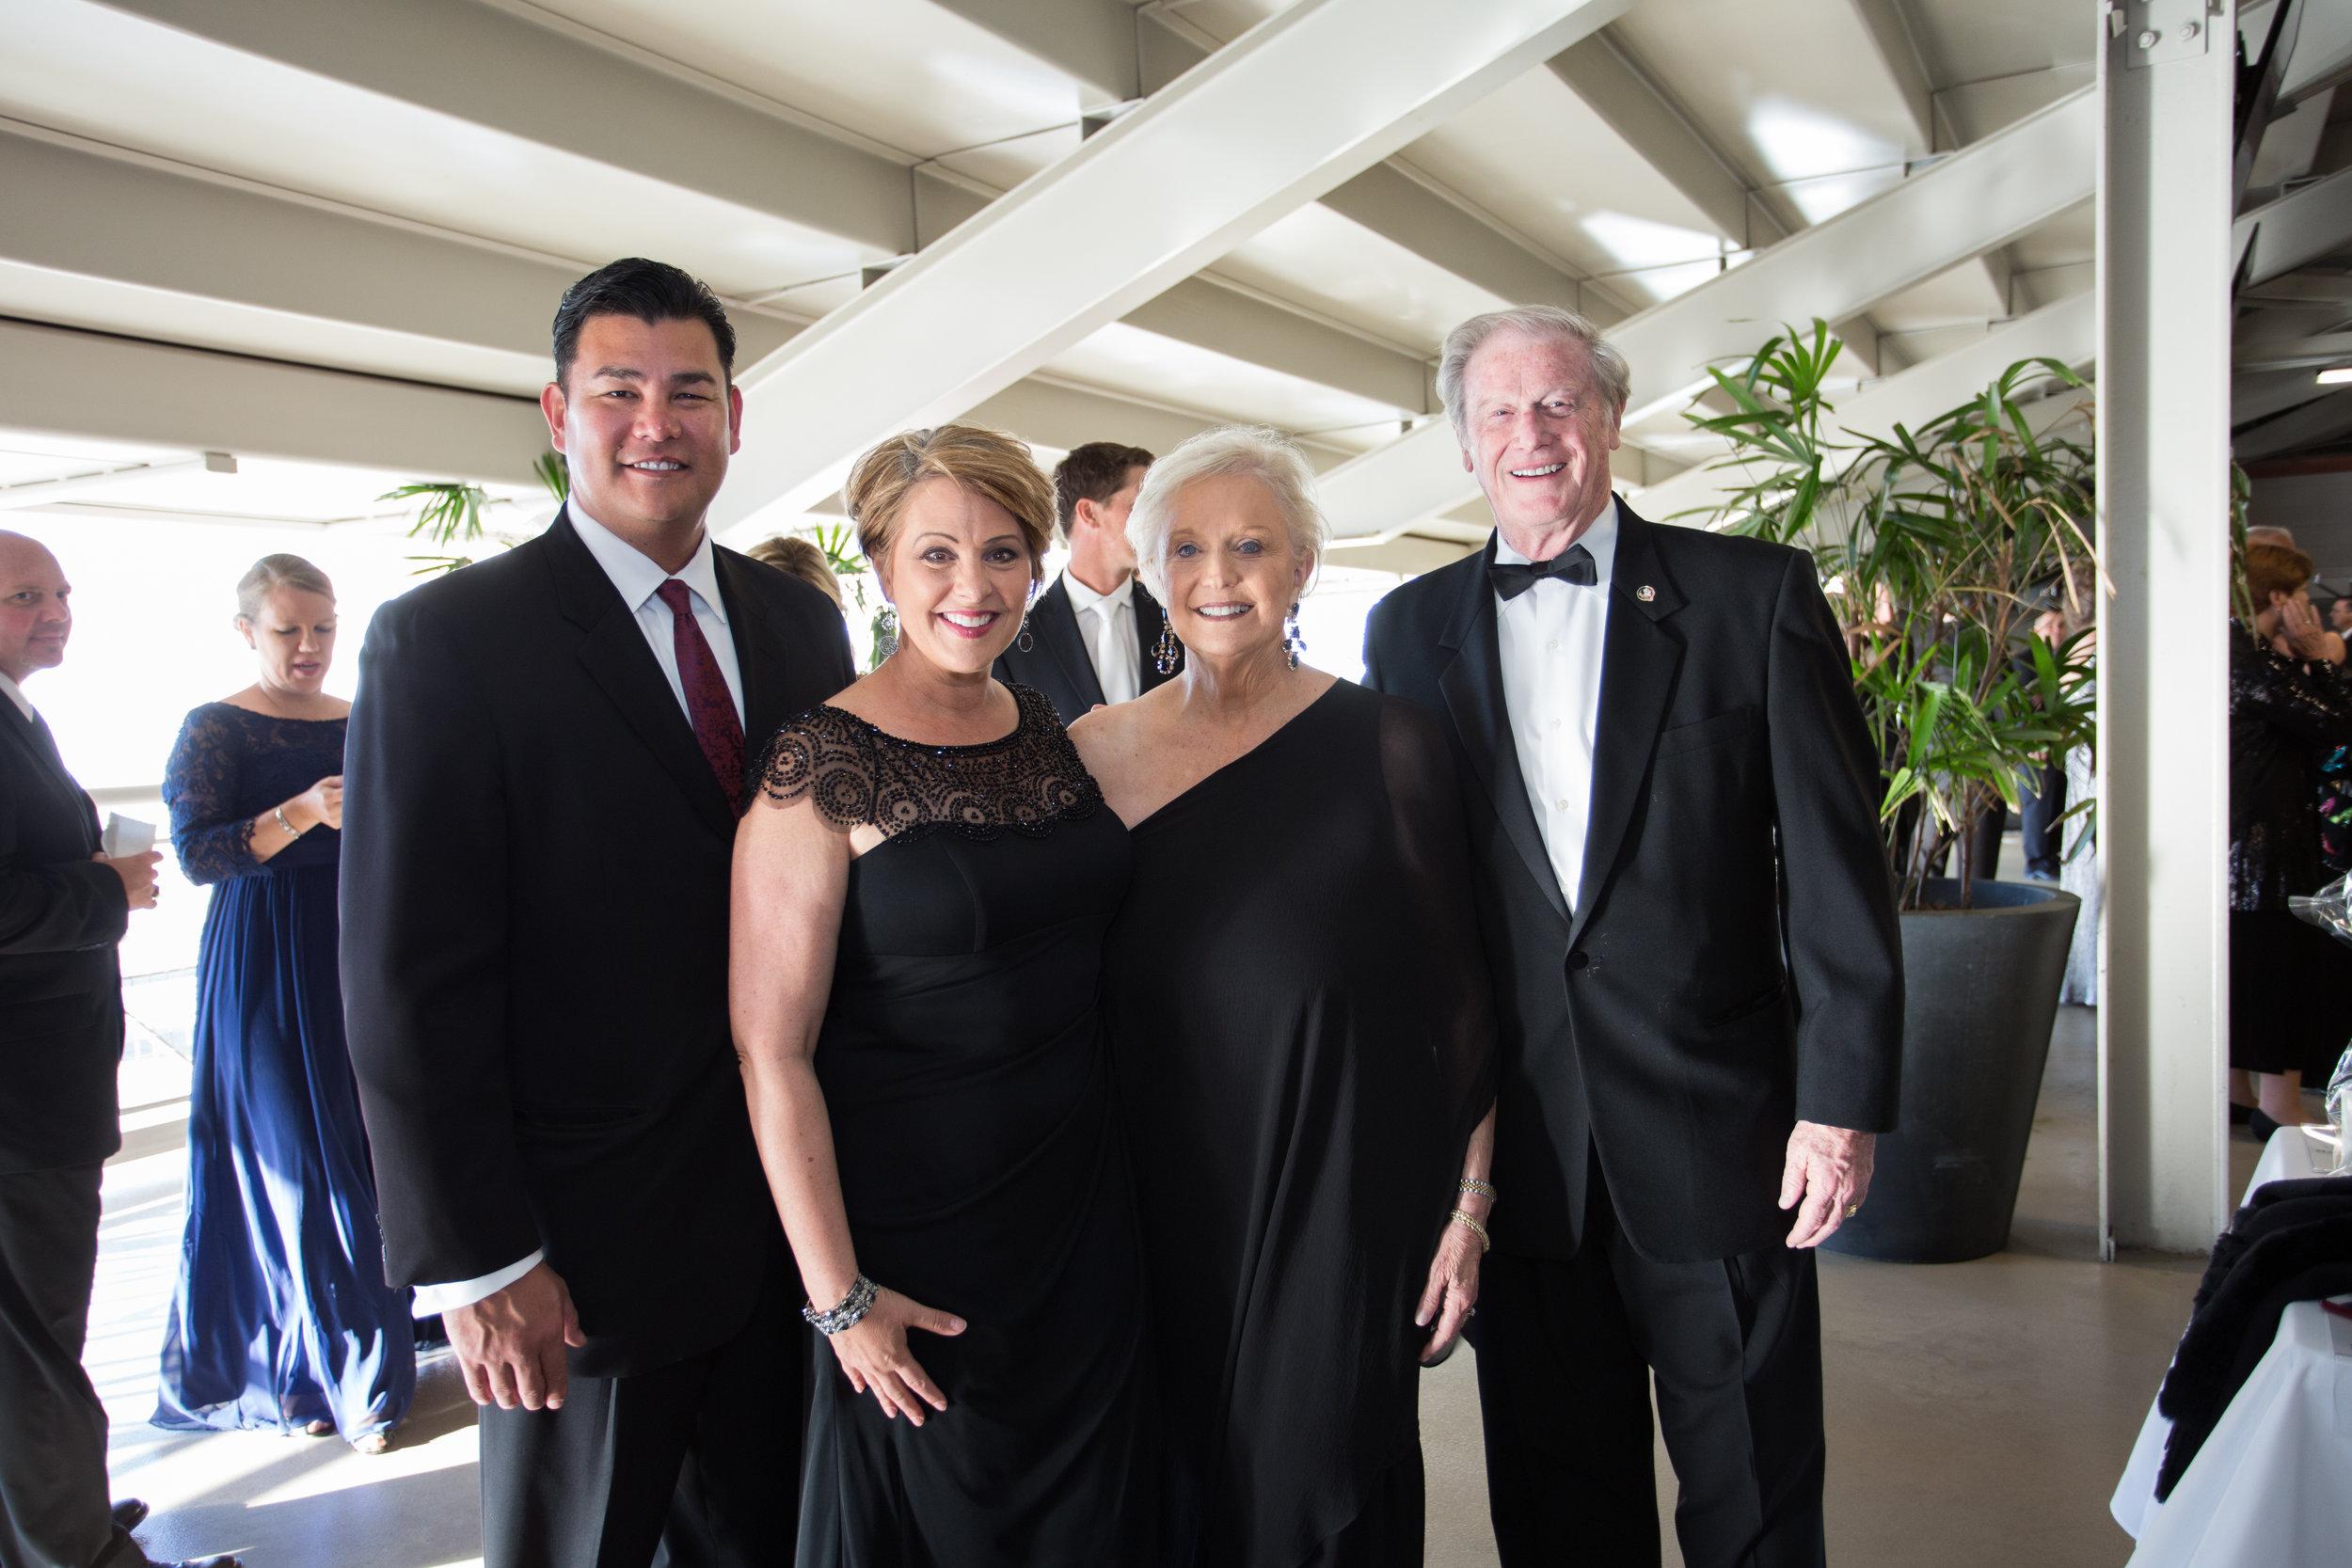 Julie Montanaro and husband Zack with President John and Mrs. Thrasher